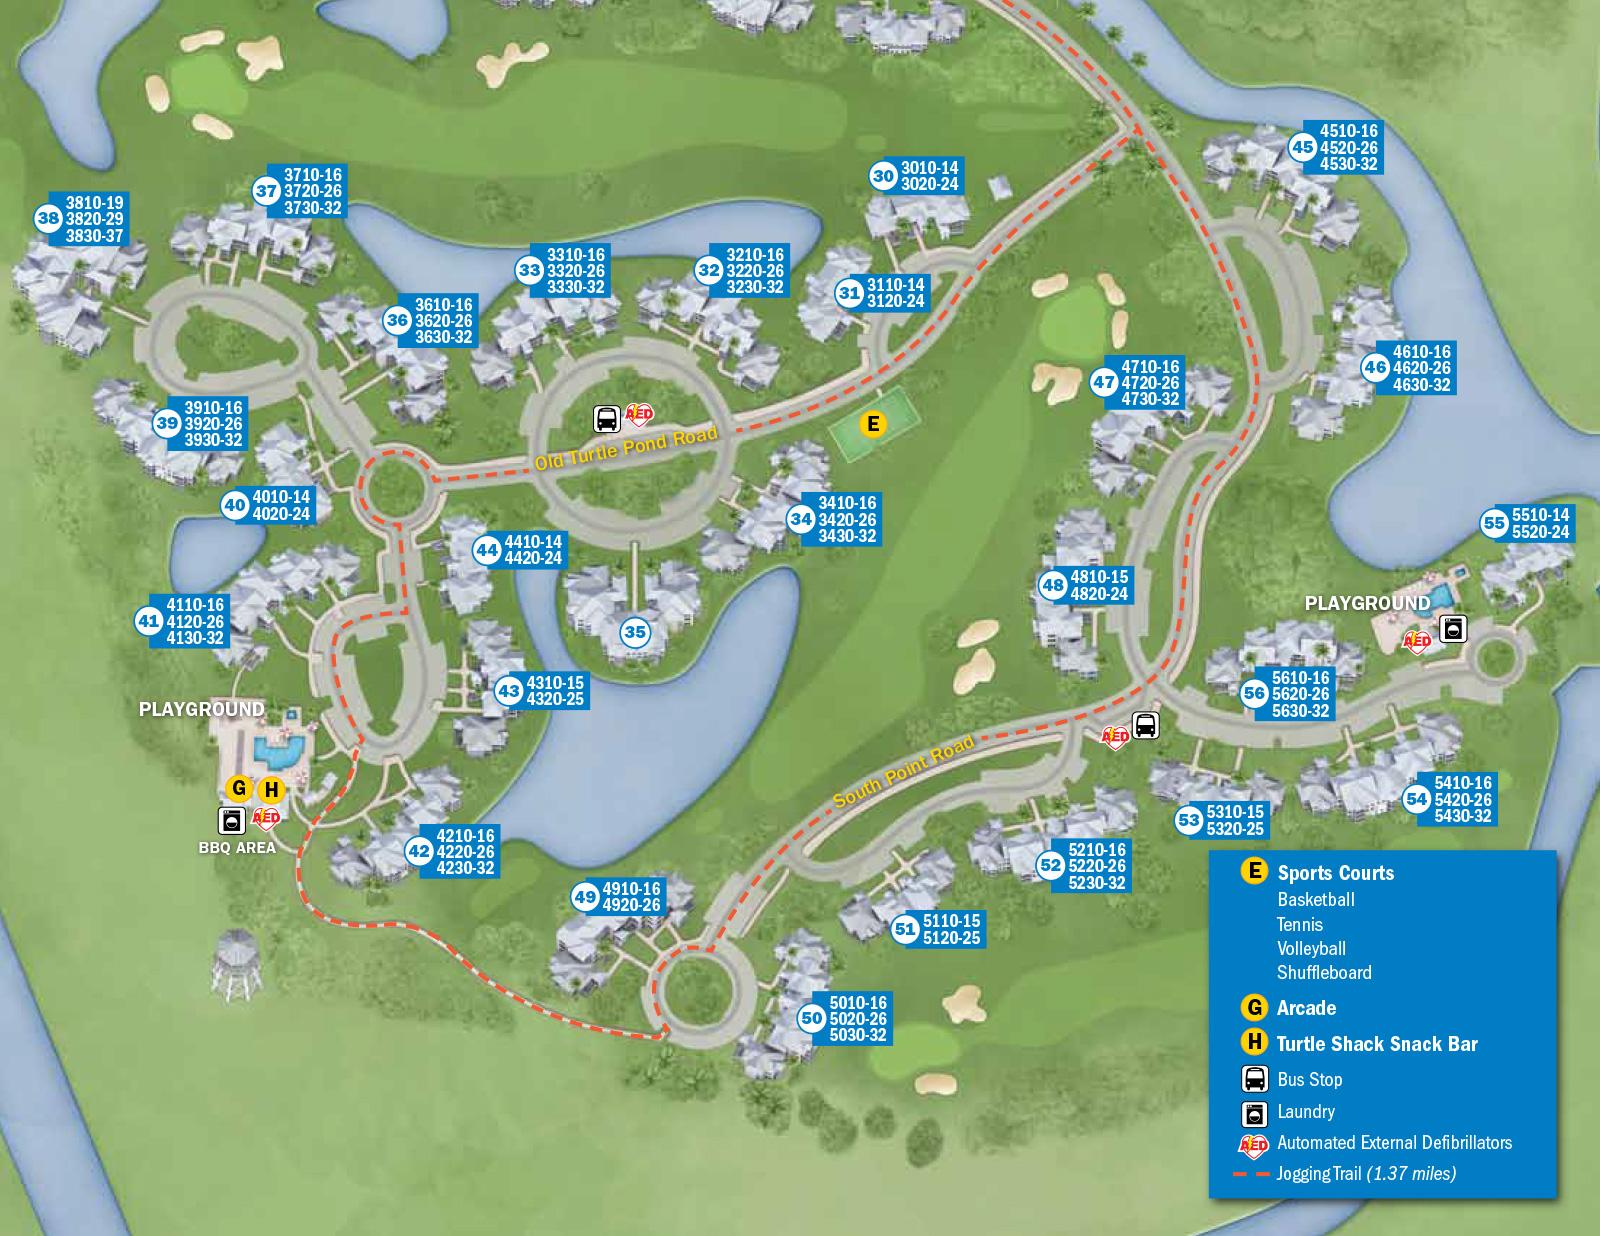 2013 Resort Hotel Maps - 25 Of 37